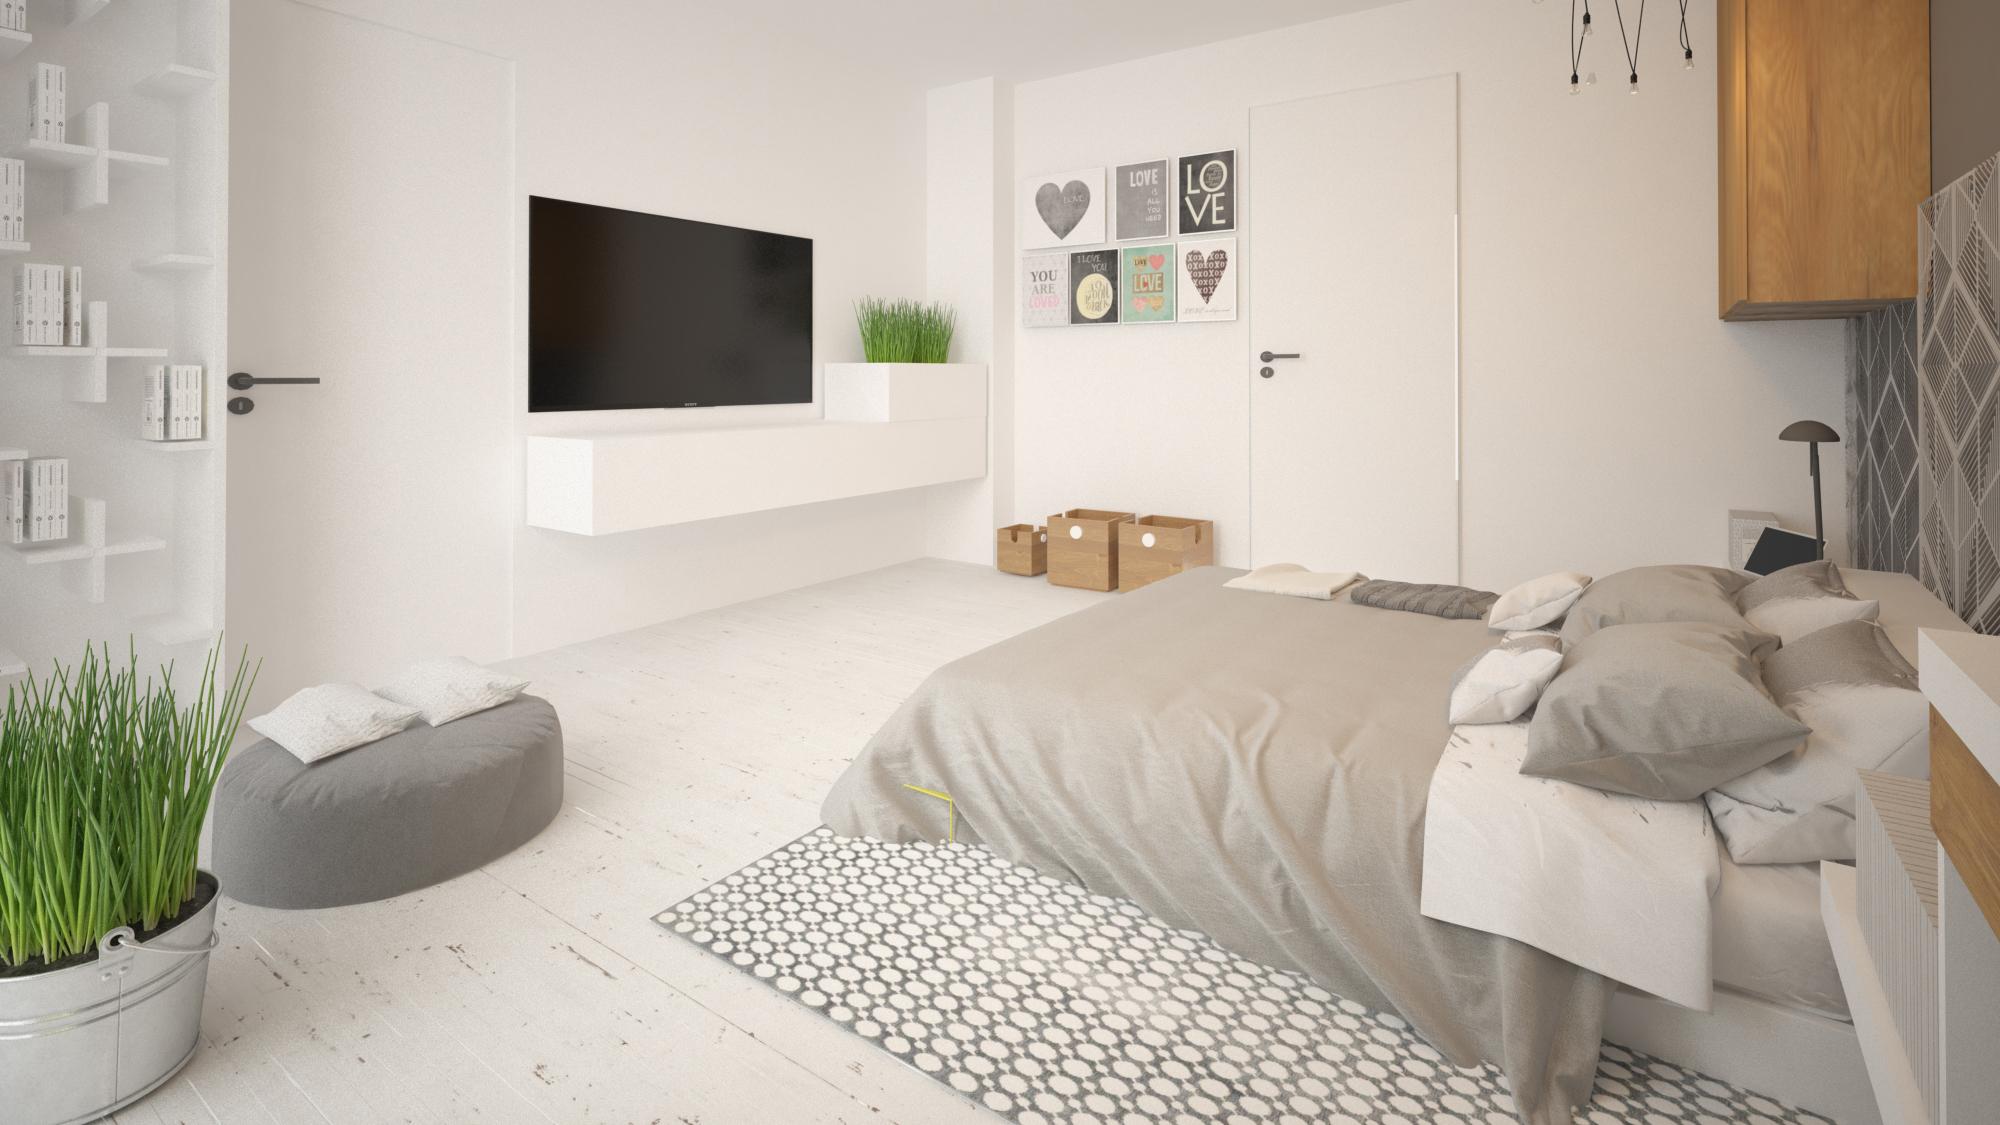 reflex-architecture-amaneajare-interioara-dormitor-kinder-2